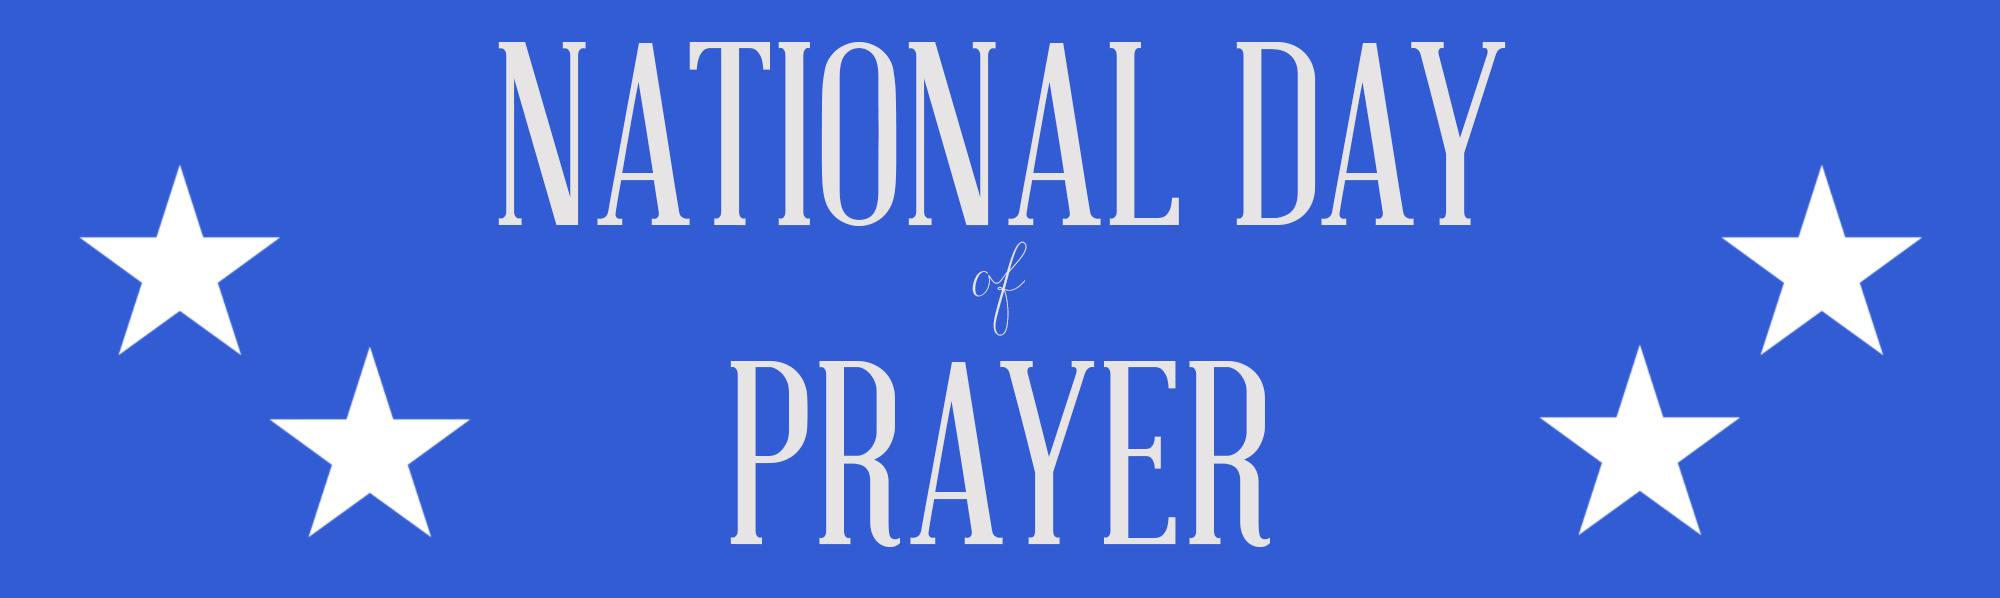 National Day of Prayer Logo Large